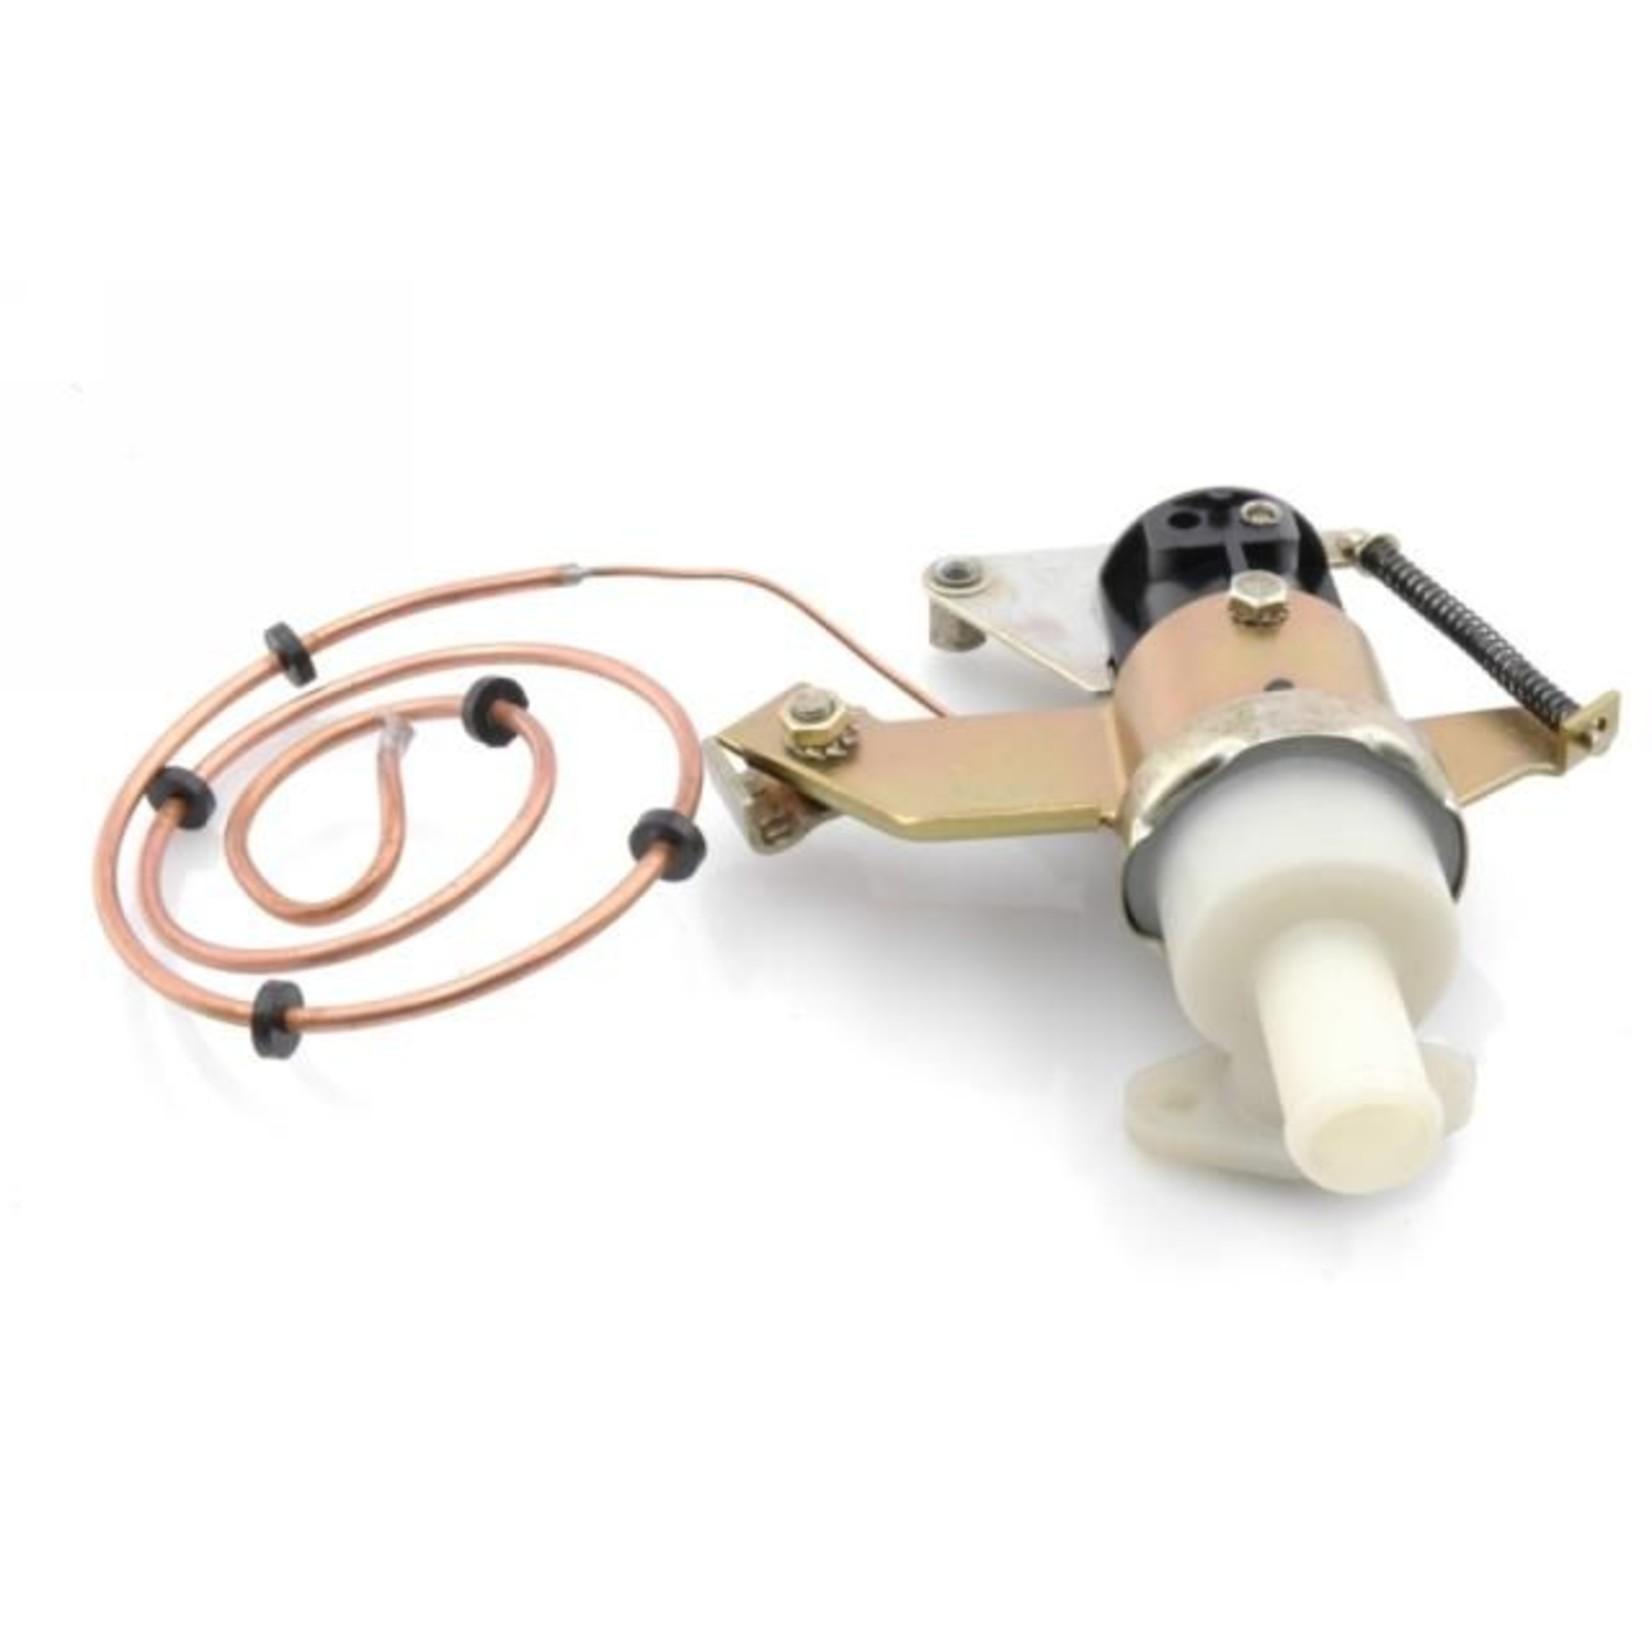 Heating valve 69- Nr Org: DX642226A